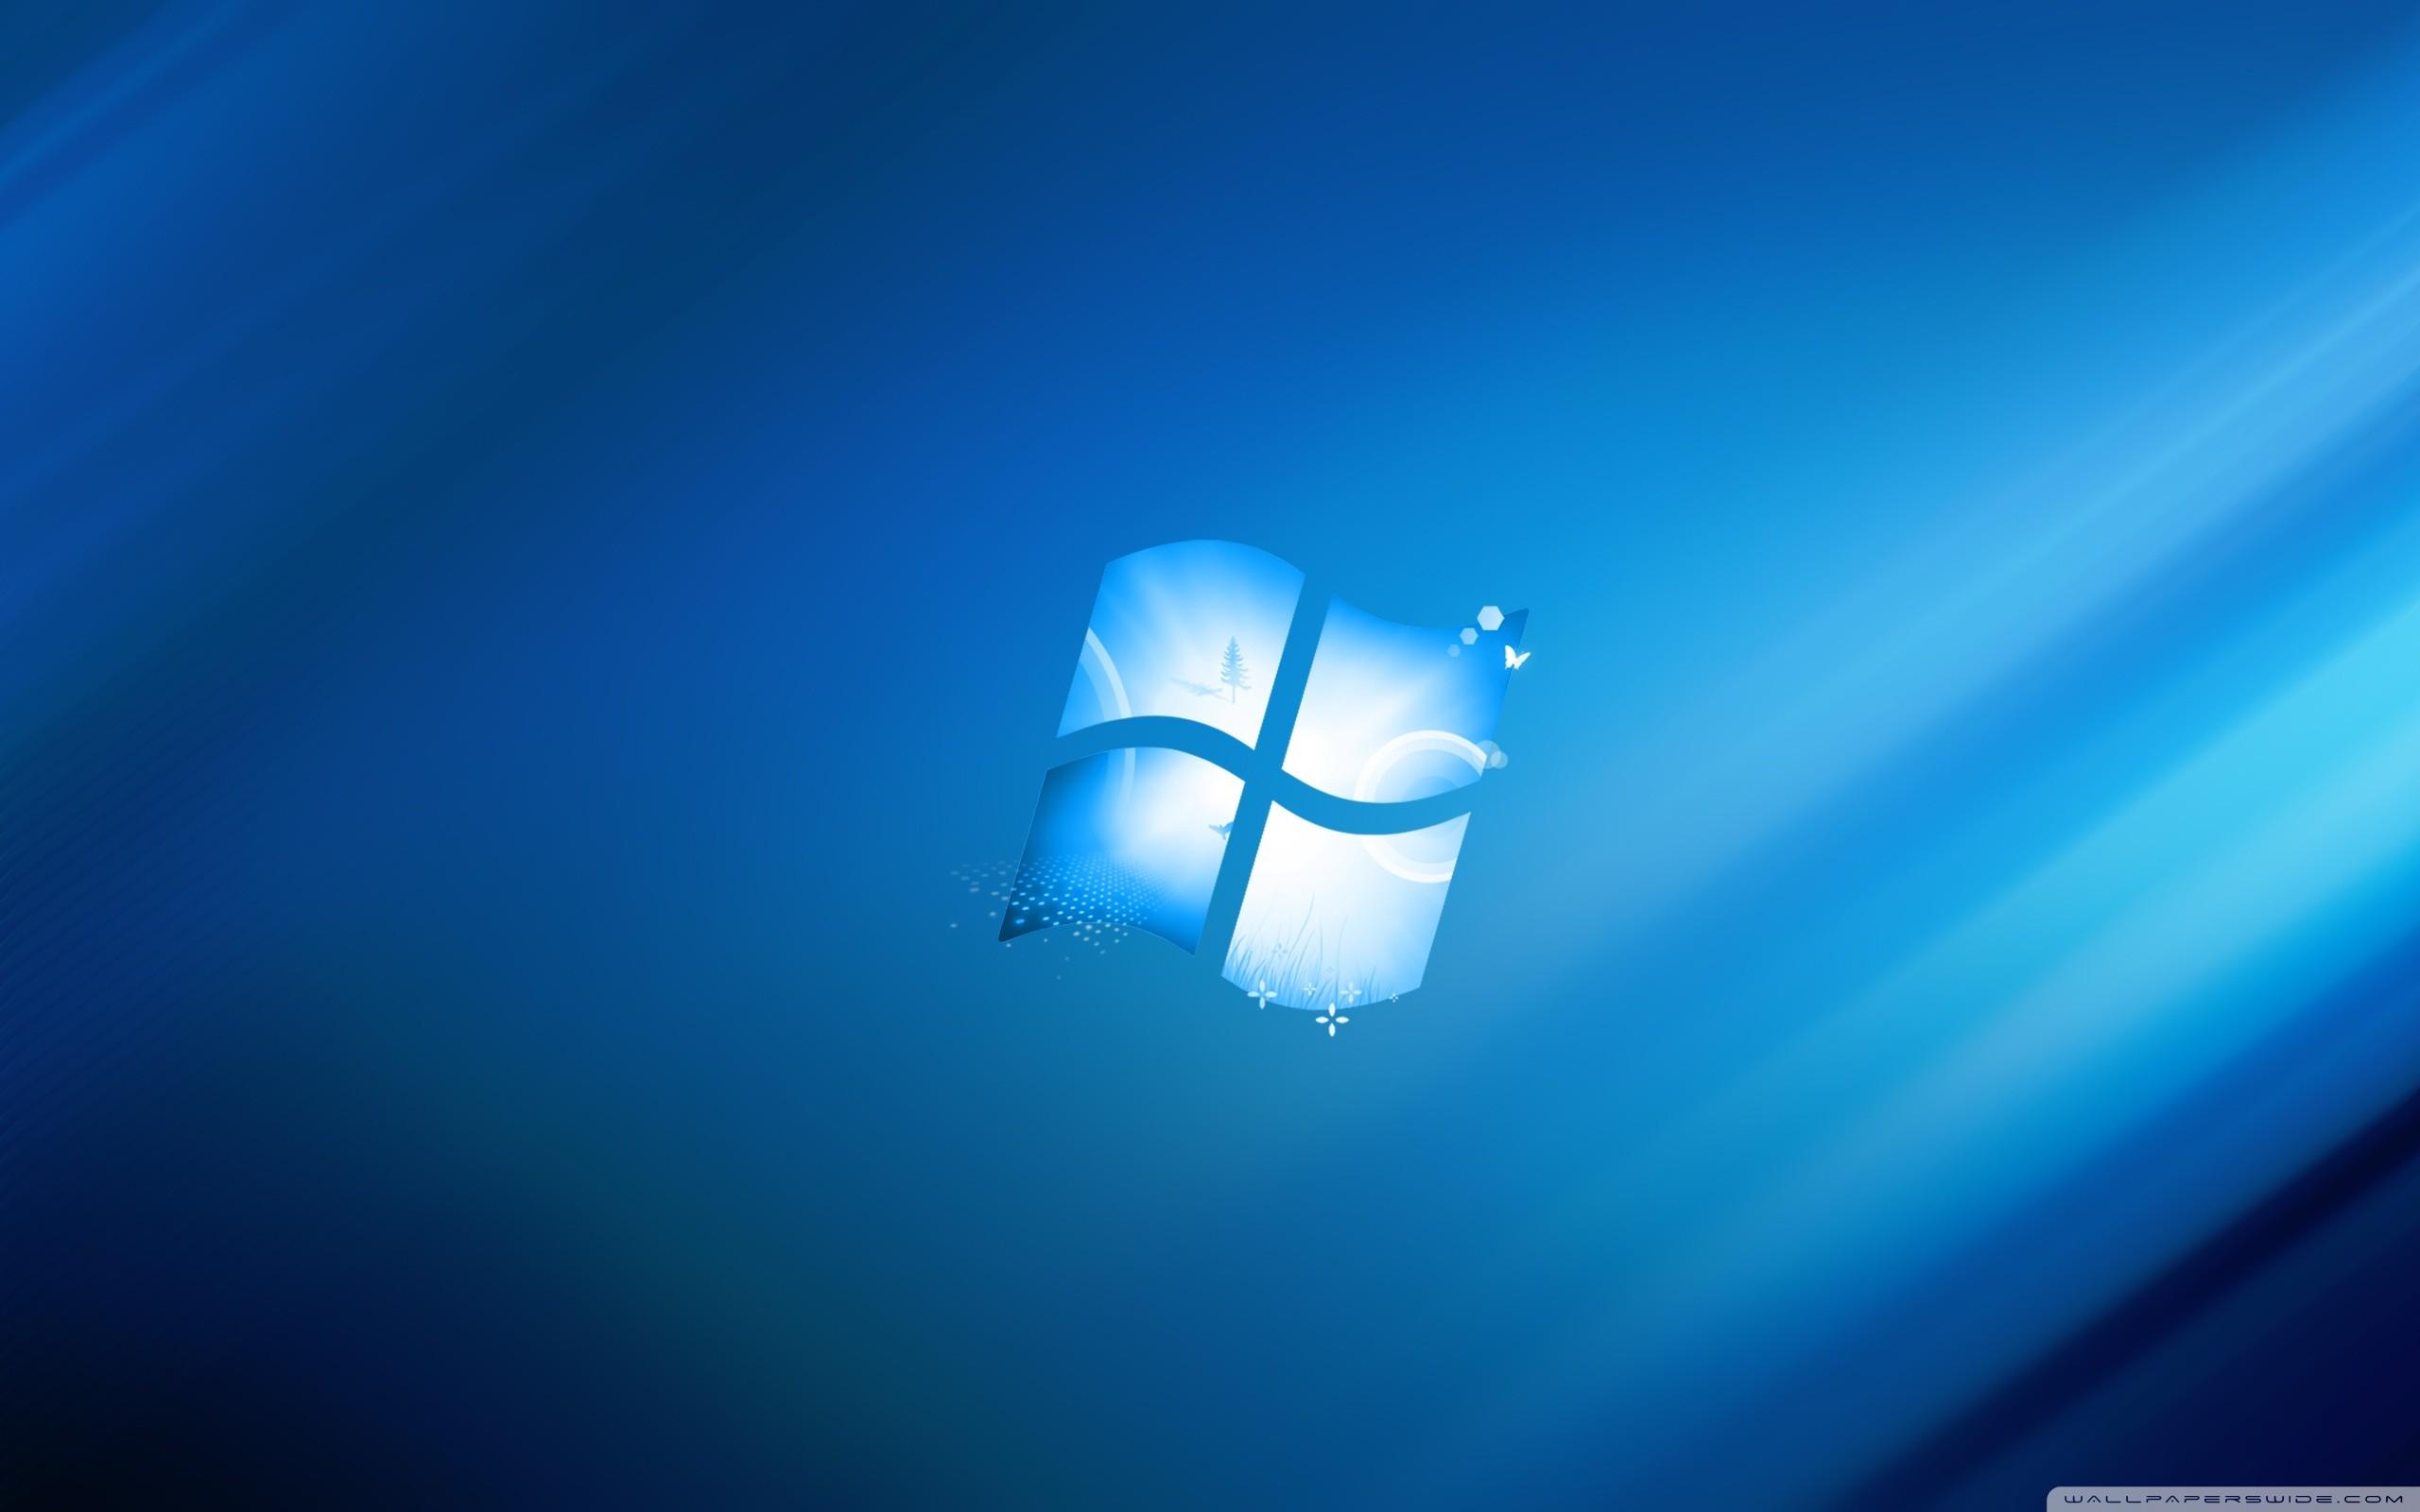 Desktop Backgrounds HD For Windows